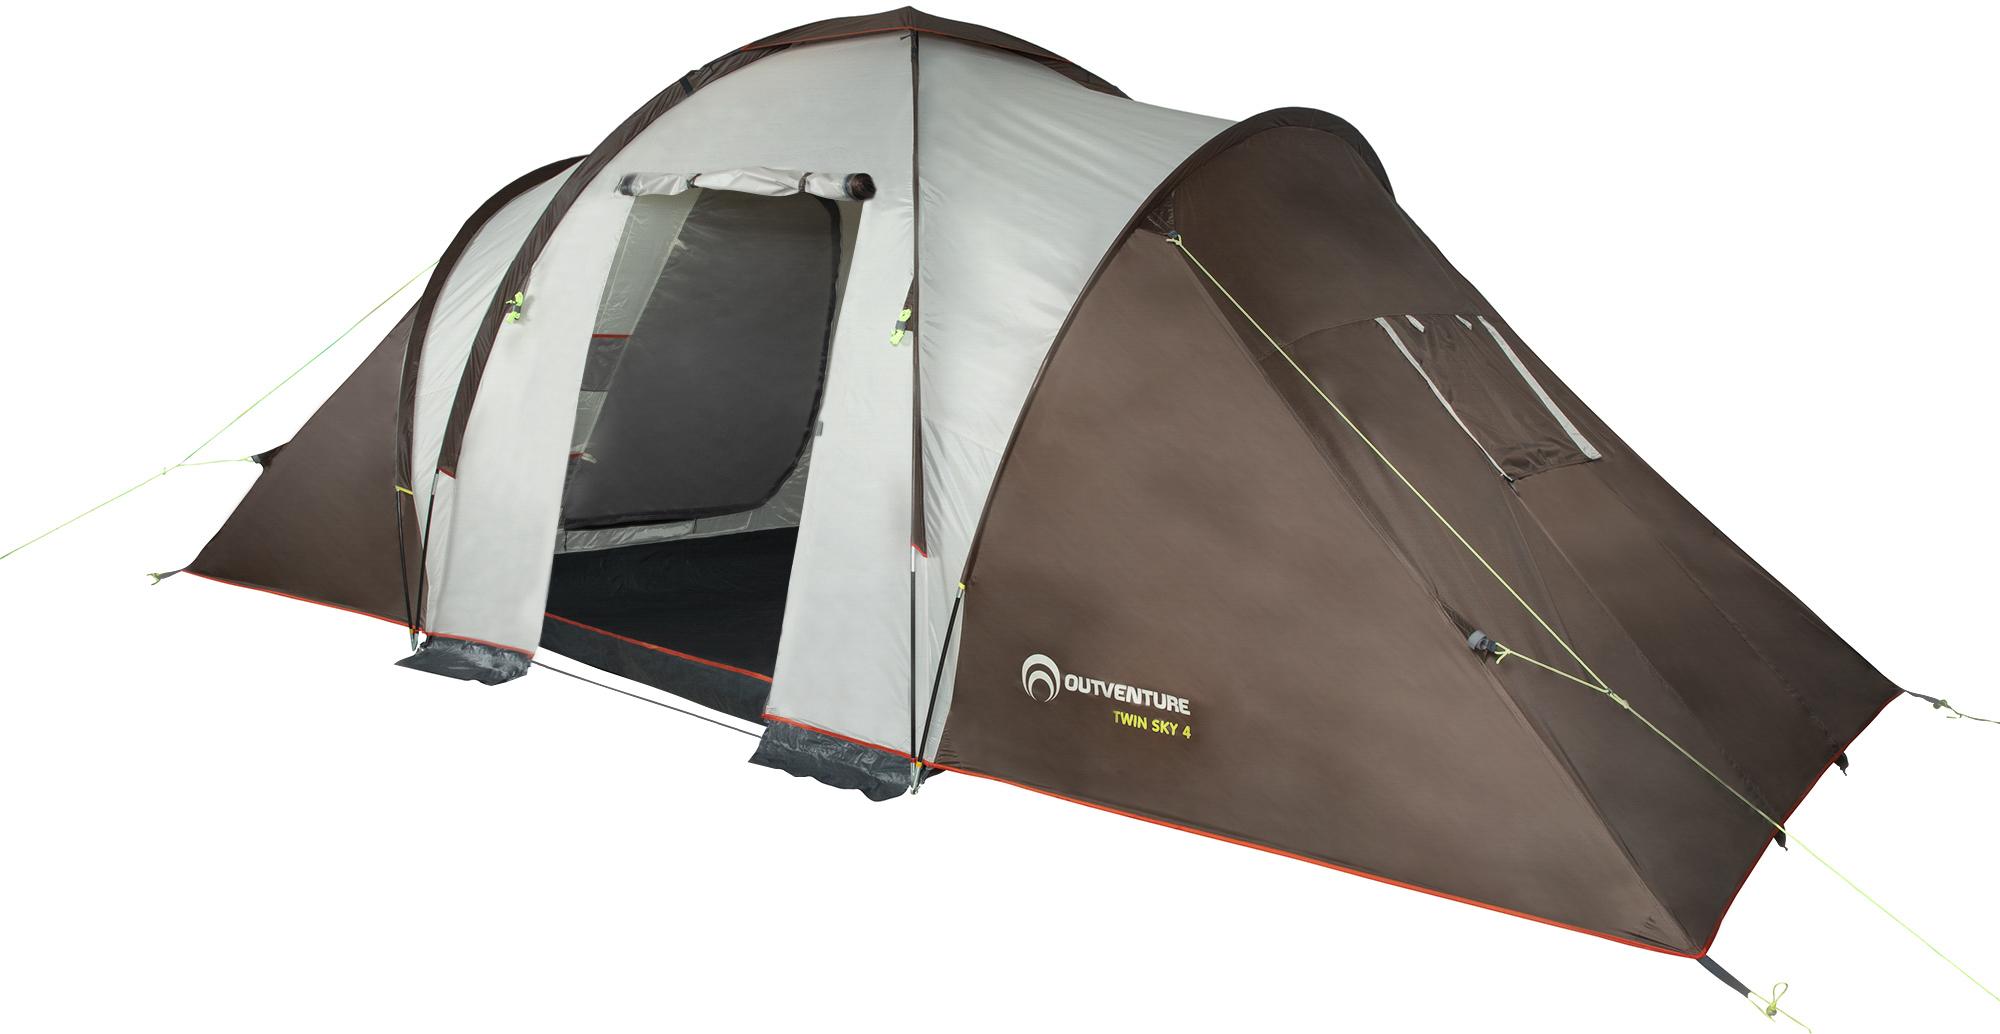 Outventure Tourist tent TWIN SKY 4 цена